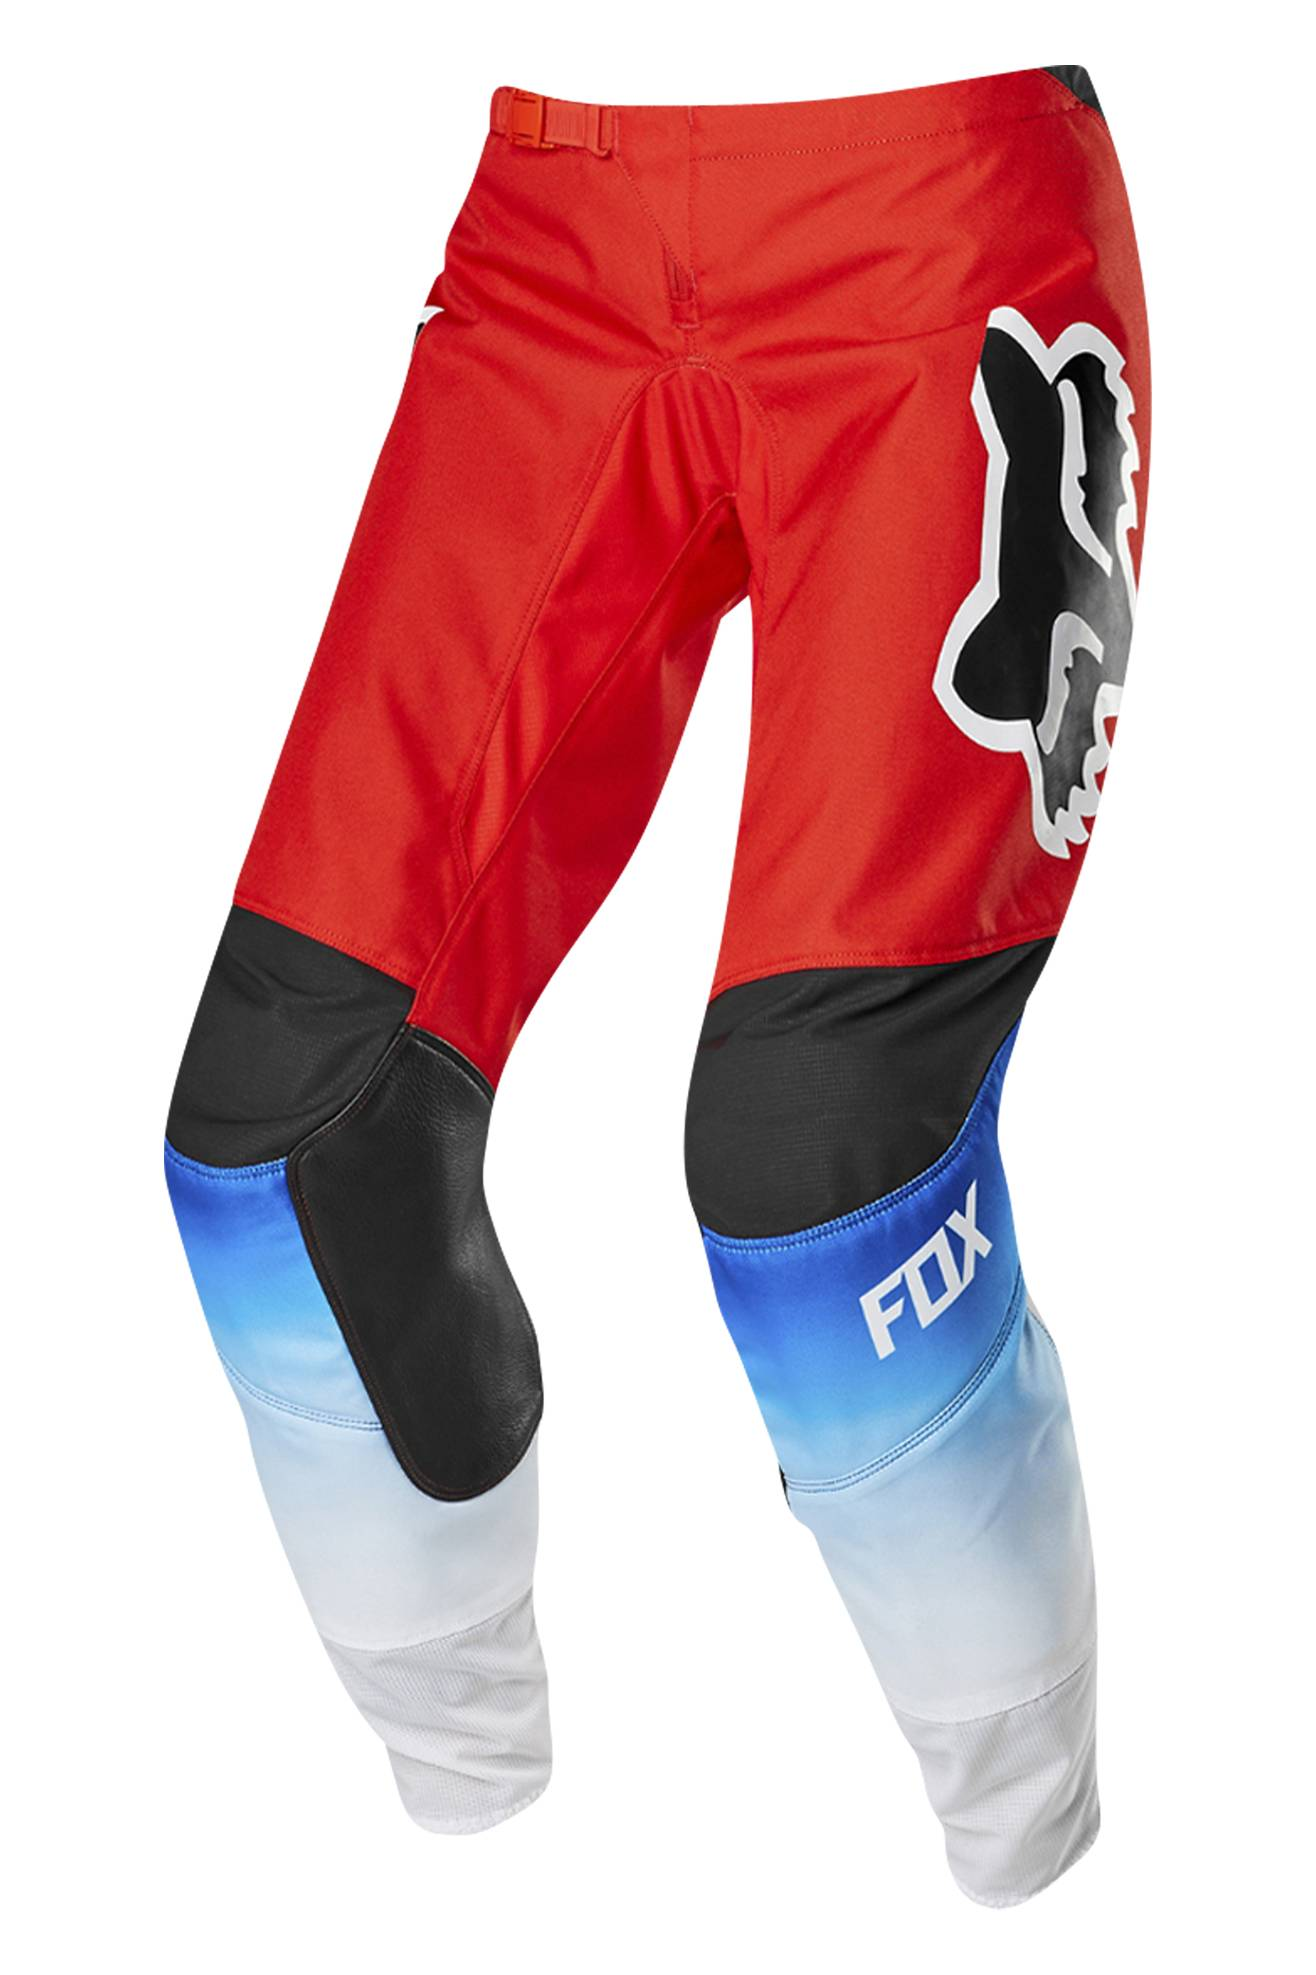 FOX Pantaloni Cross Donna  Racing 180 Fyce Blu-Rosso